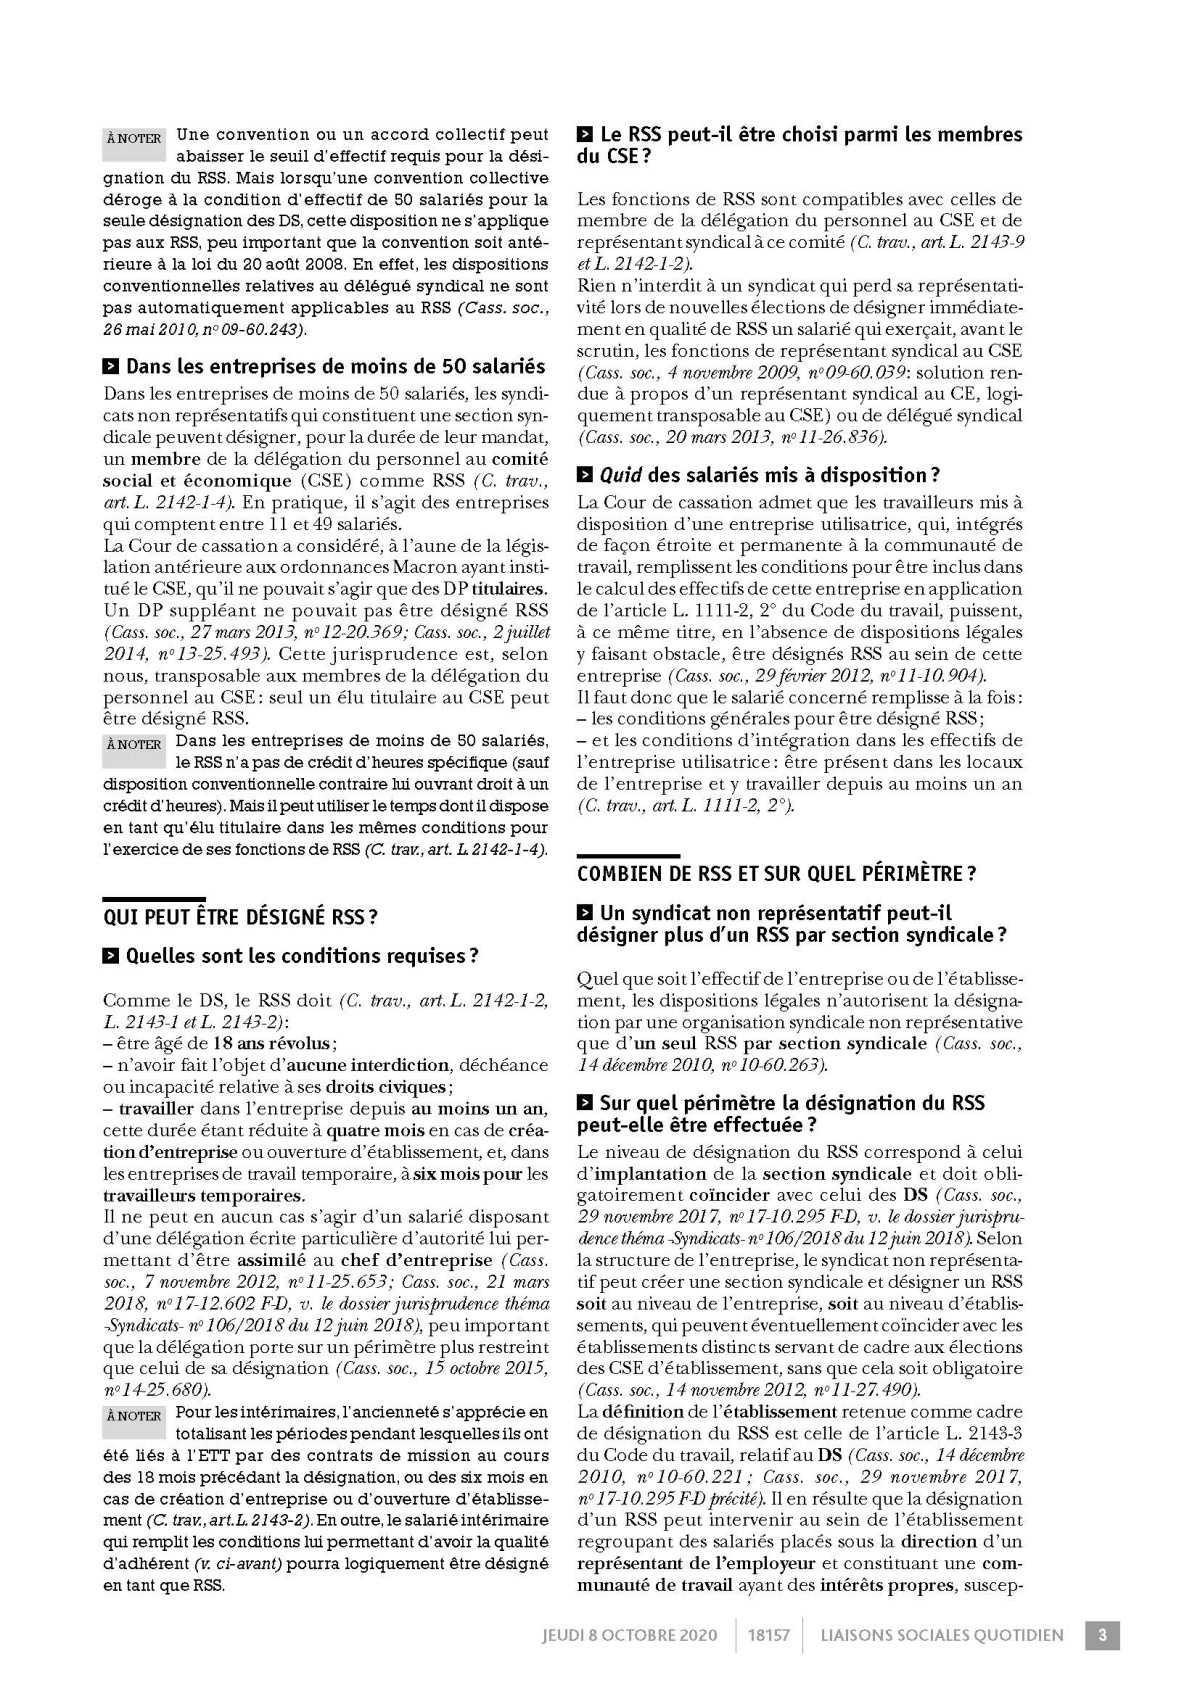 Dossier LSQ concernant le RSS